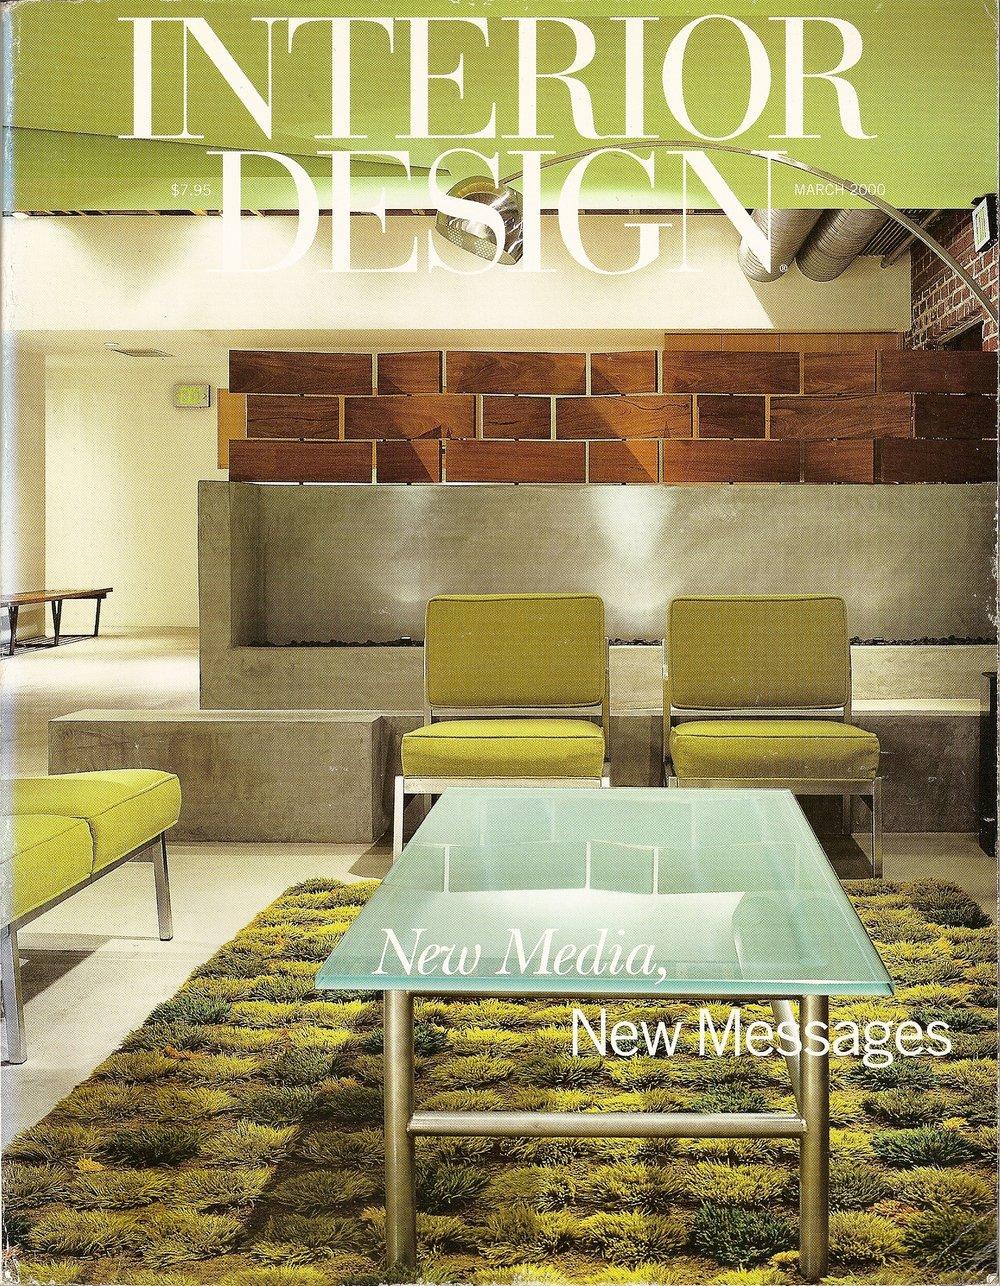 INTERIOR DESIGN - MARCH 2000